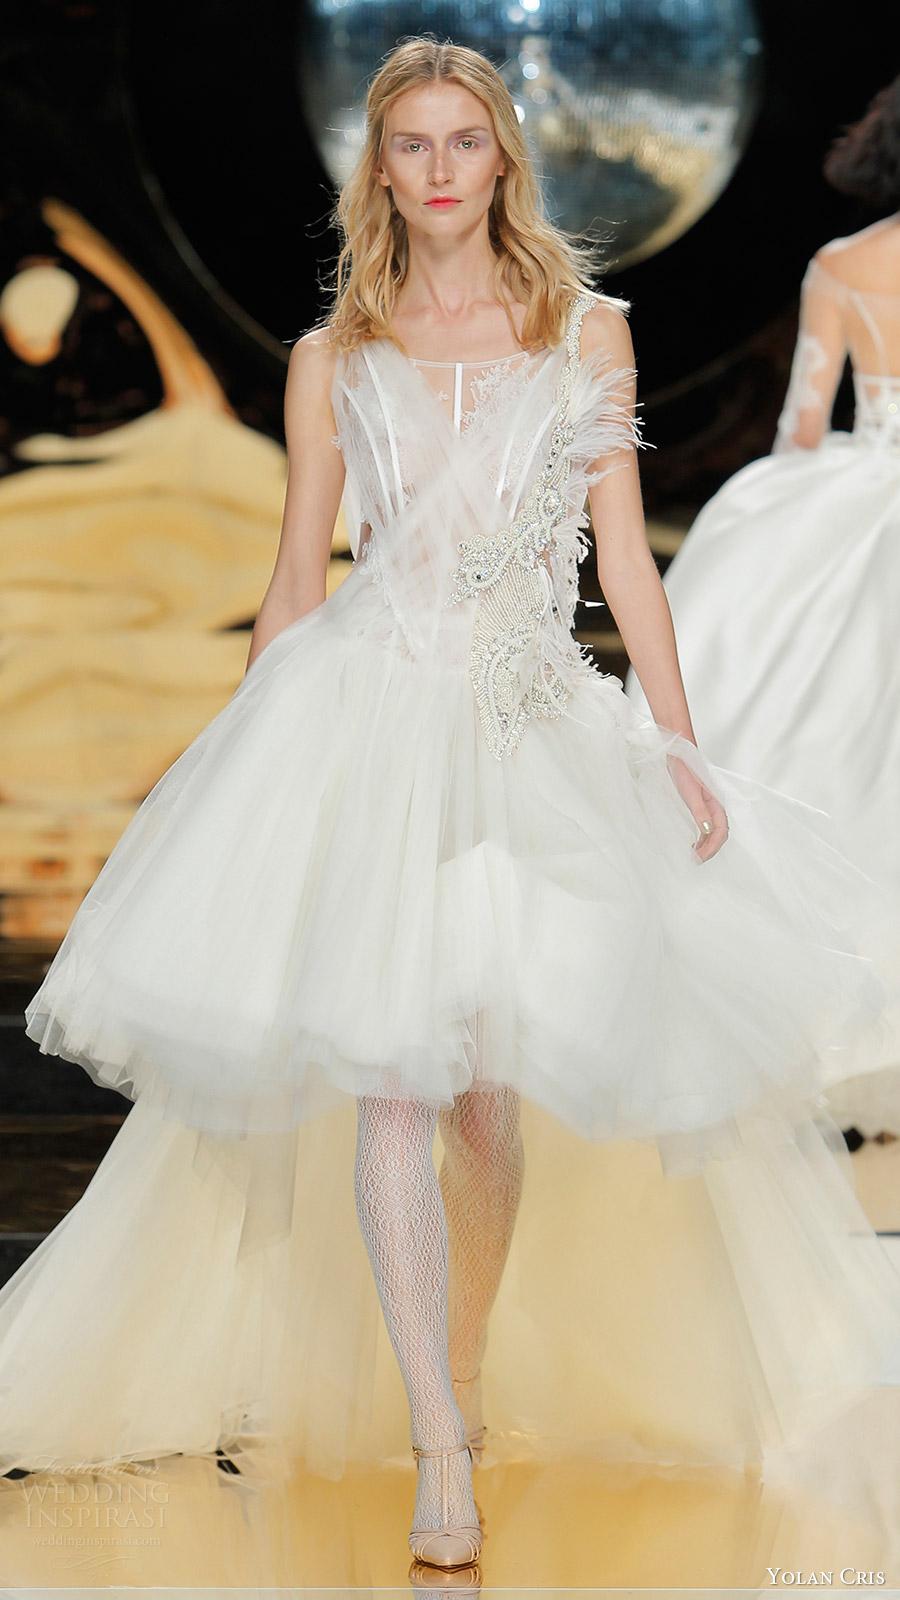 Yolan Cris Bridal 2017 Wedding Dresses - BridalPulse